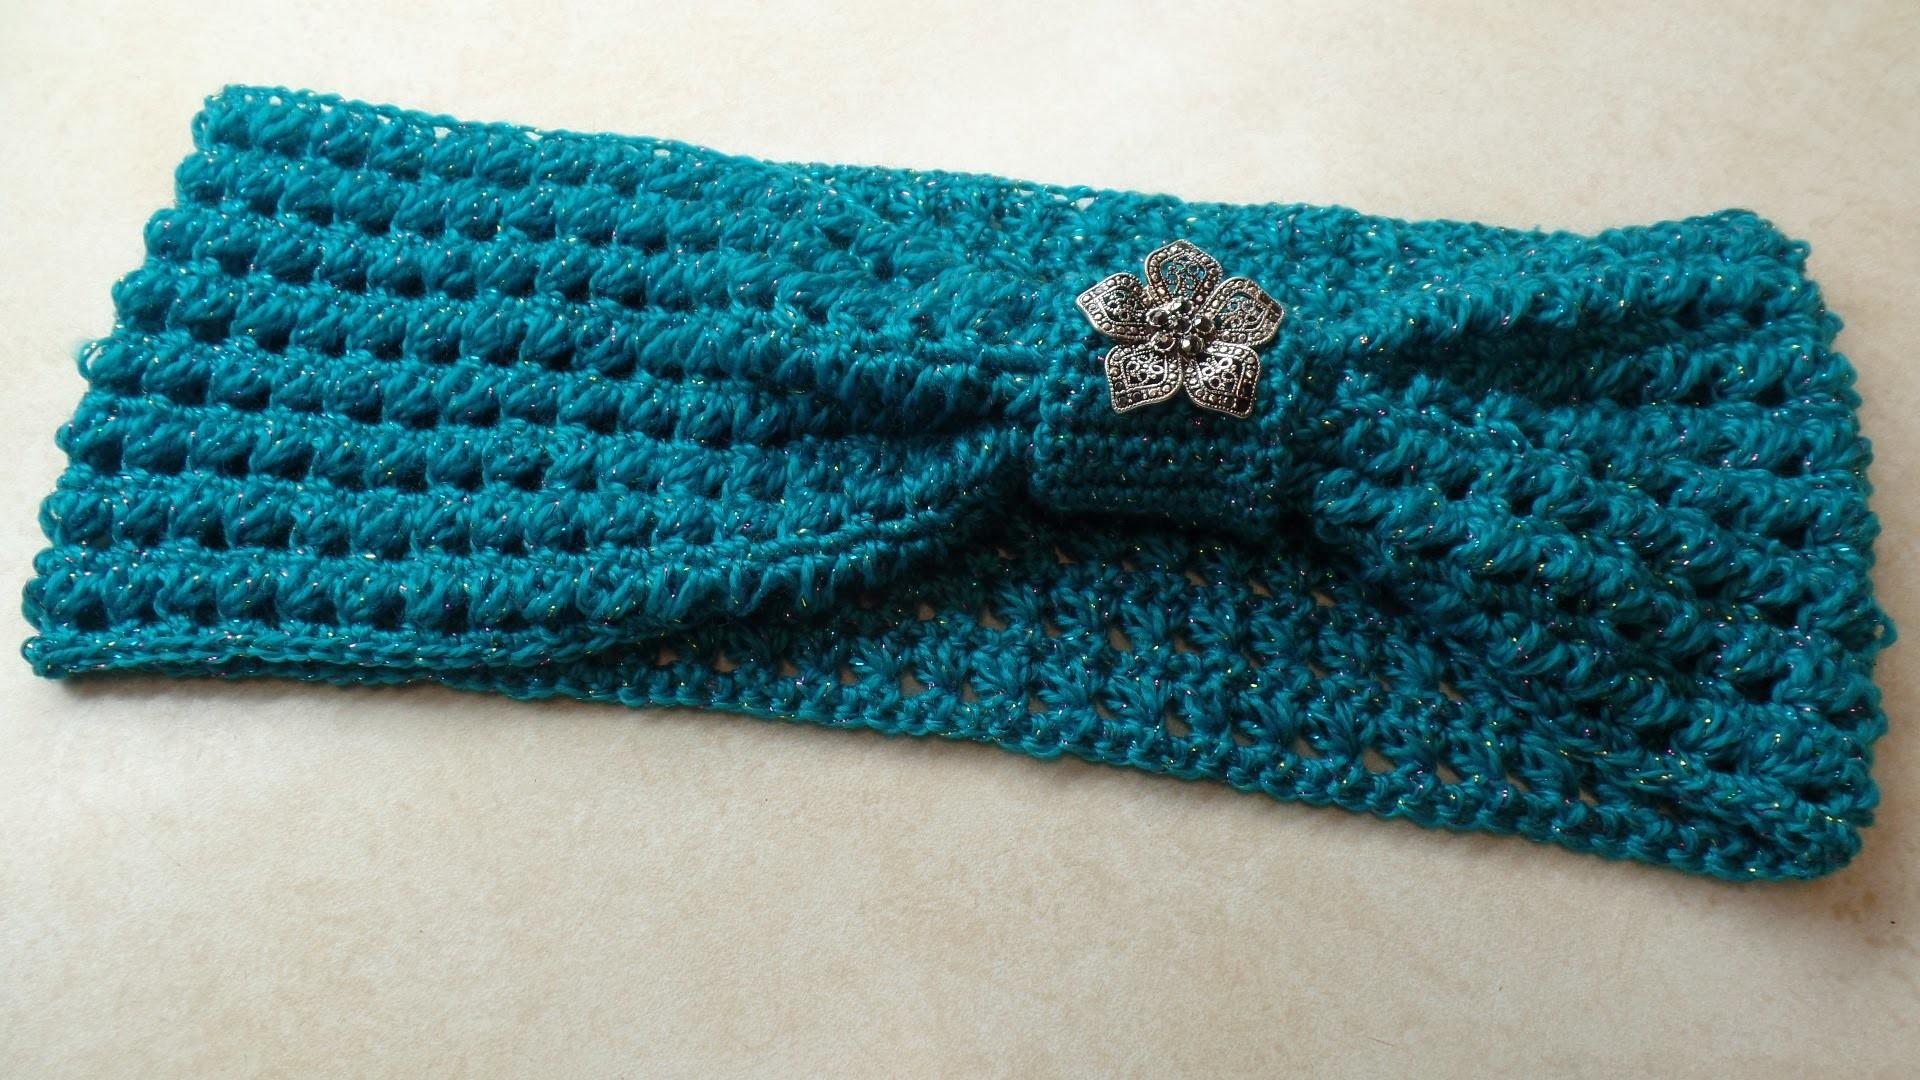 #Crochet Triangle Stitch Cowl Scarf #TUTORIAL